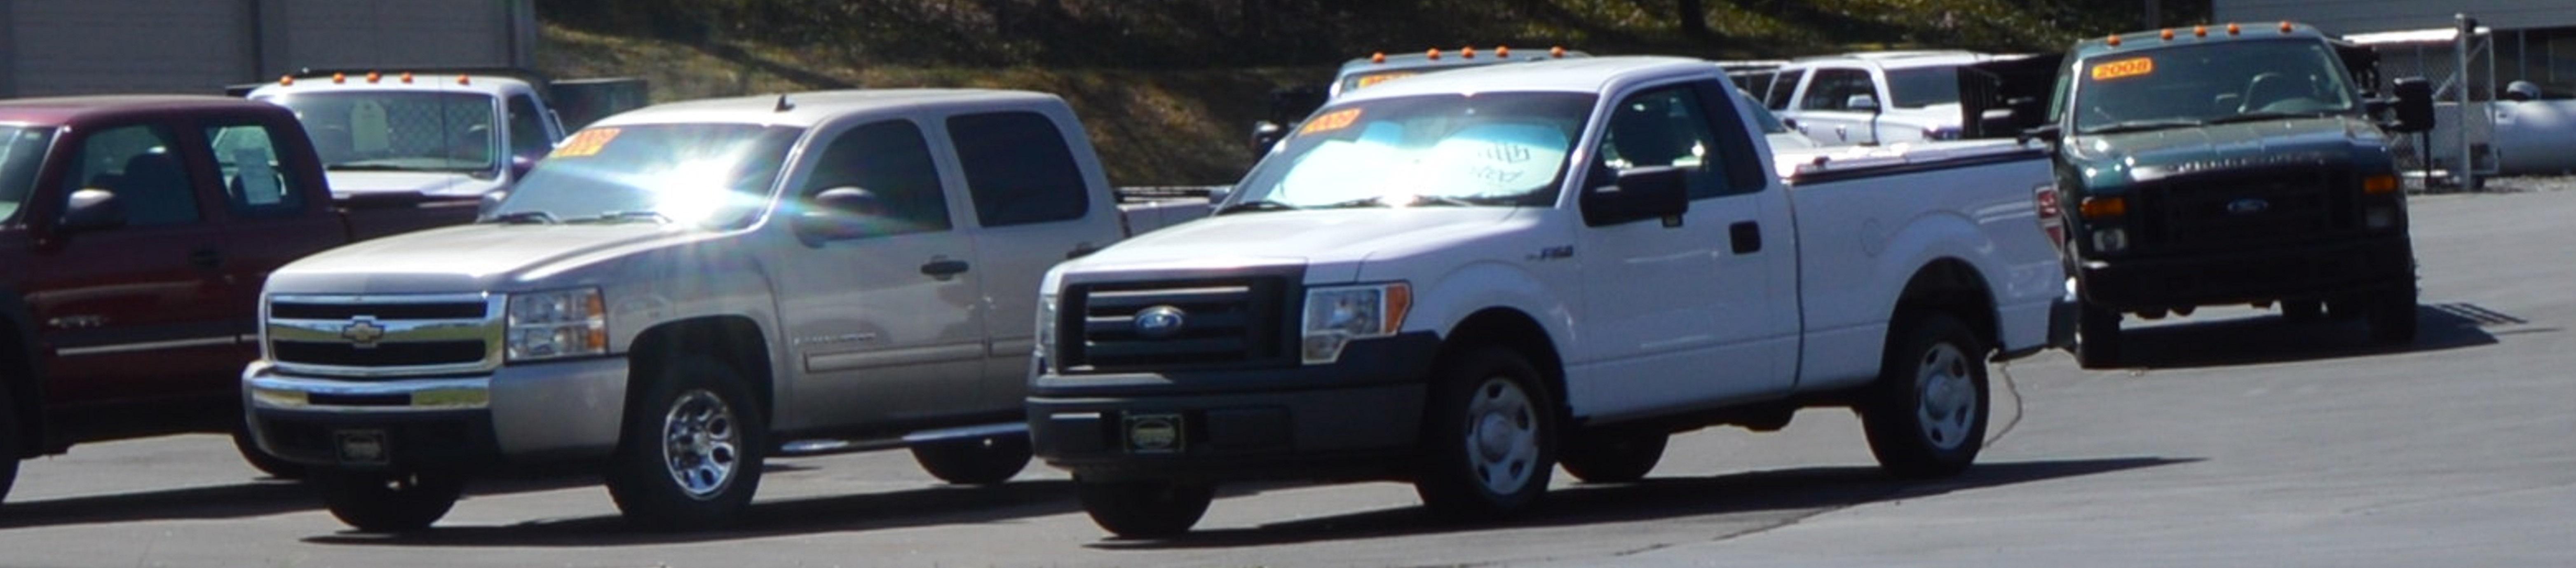 Premier Commercial Trucks image 2